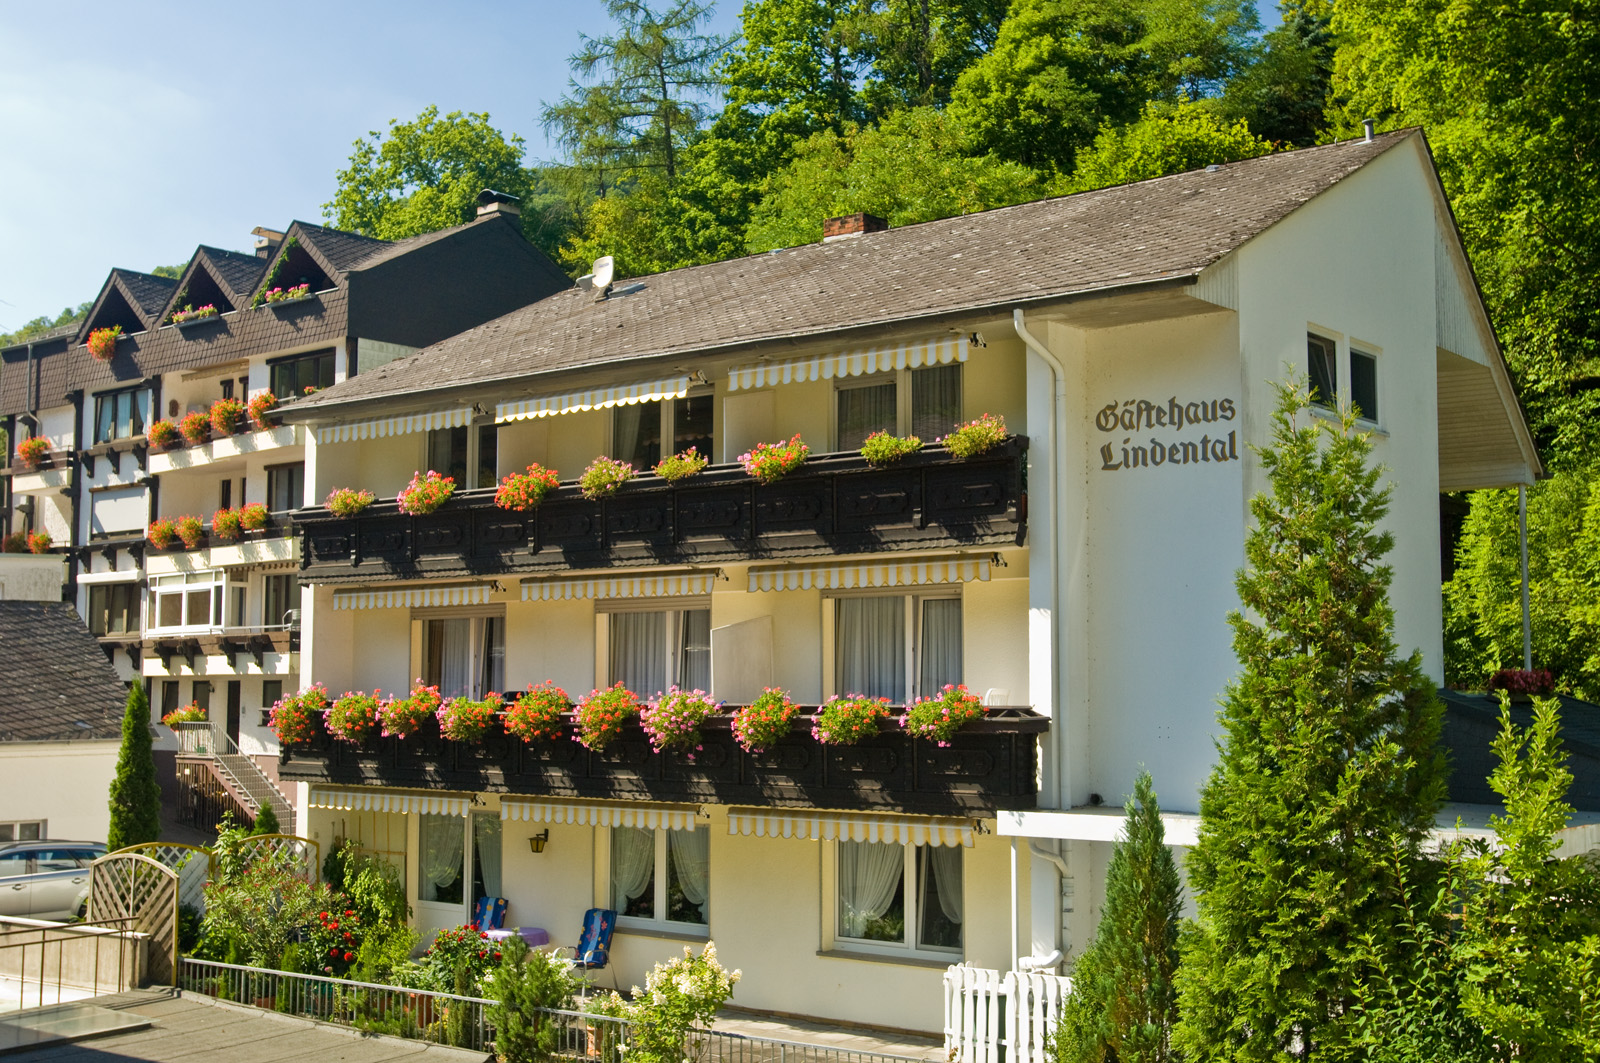 Bikerhotel germany eifel lindental rooms your for Design hotel eifel euskirchen germany